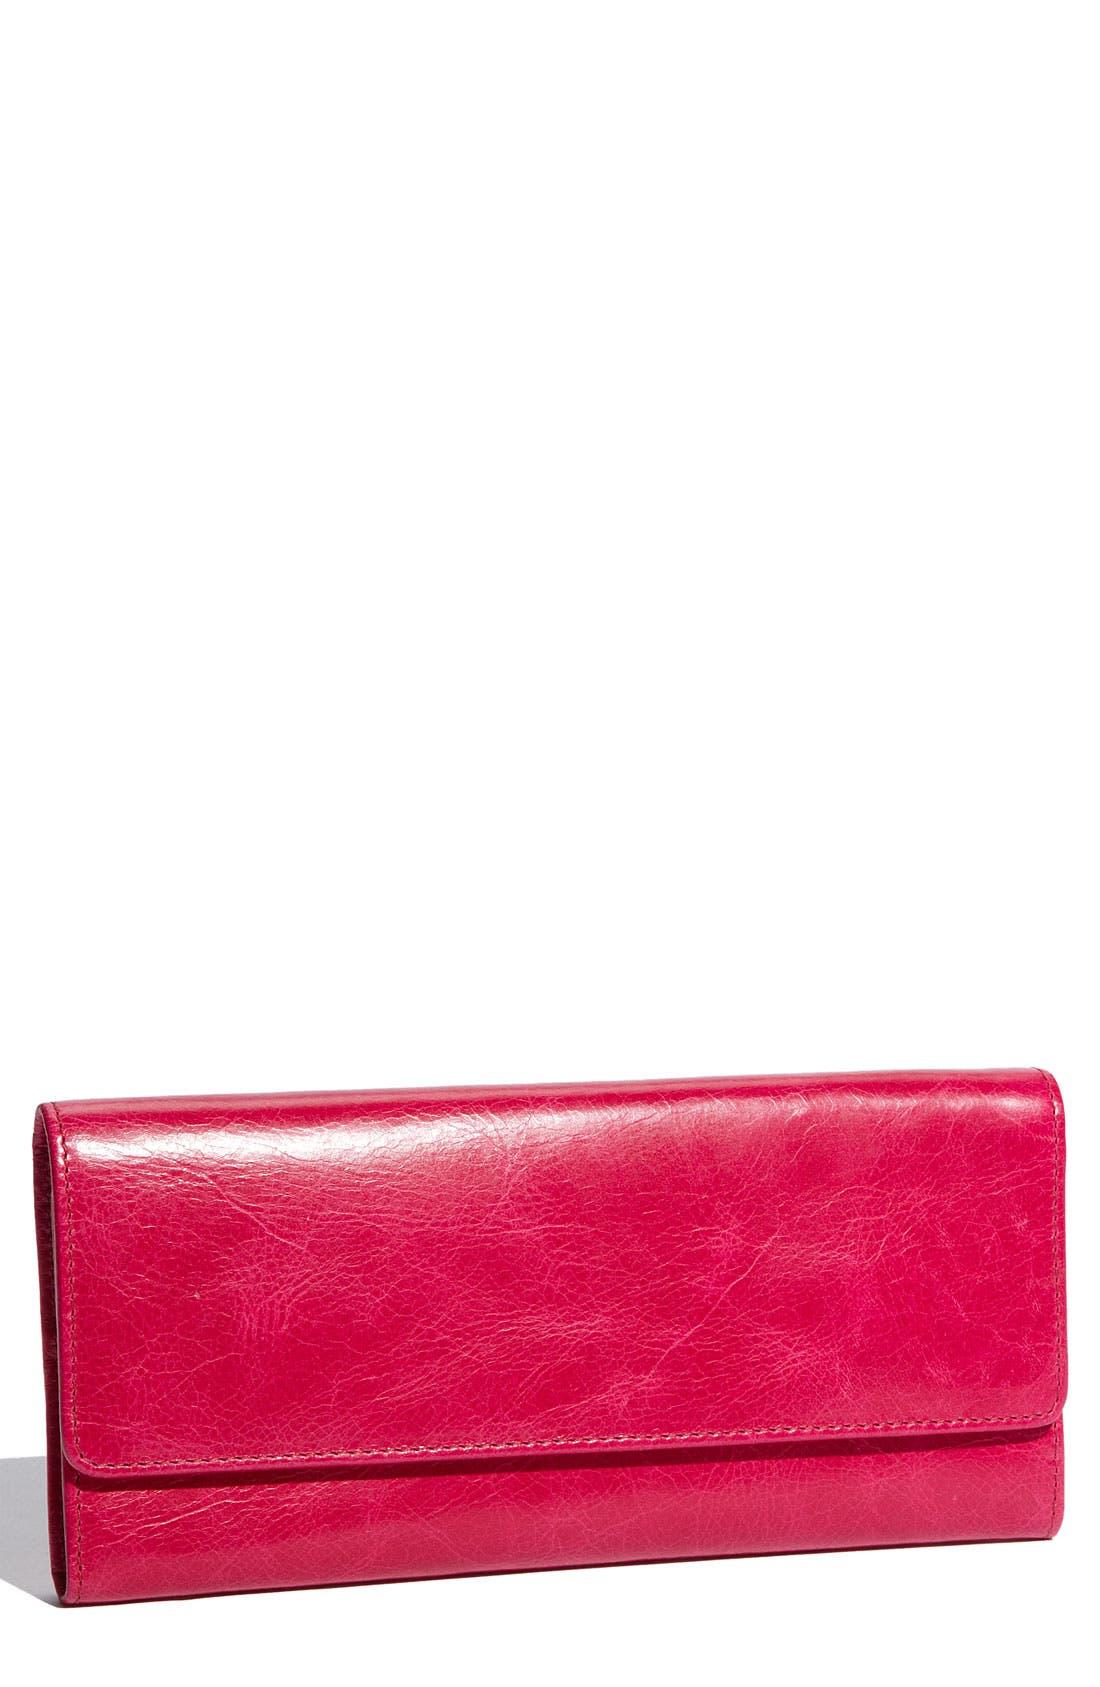 'Sadie' Leather Wallet,                             Main thumbnail 63, color,